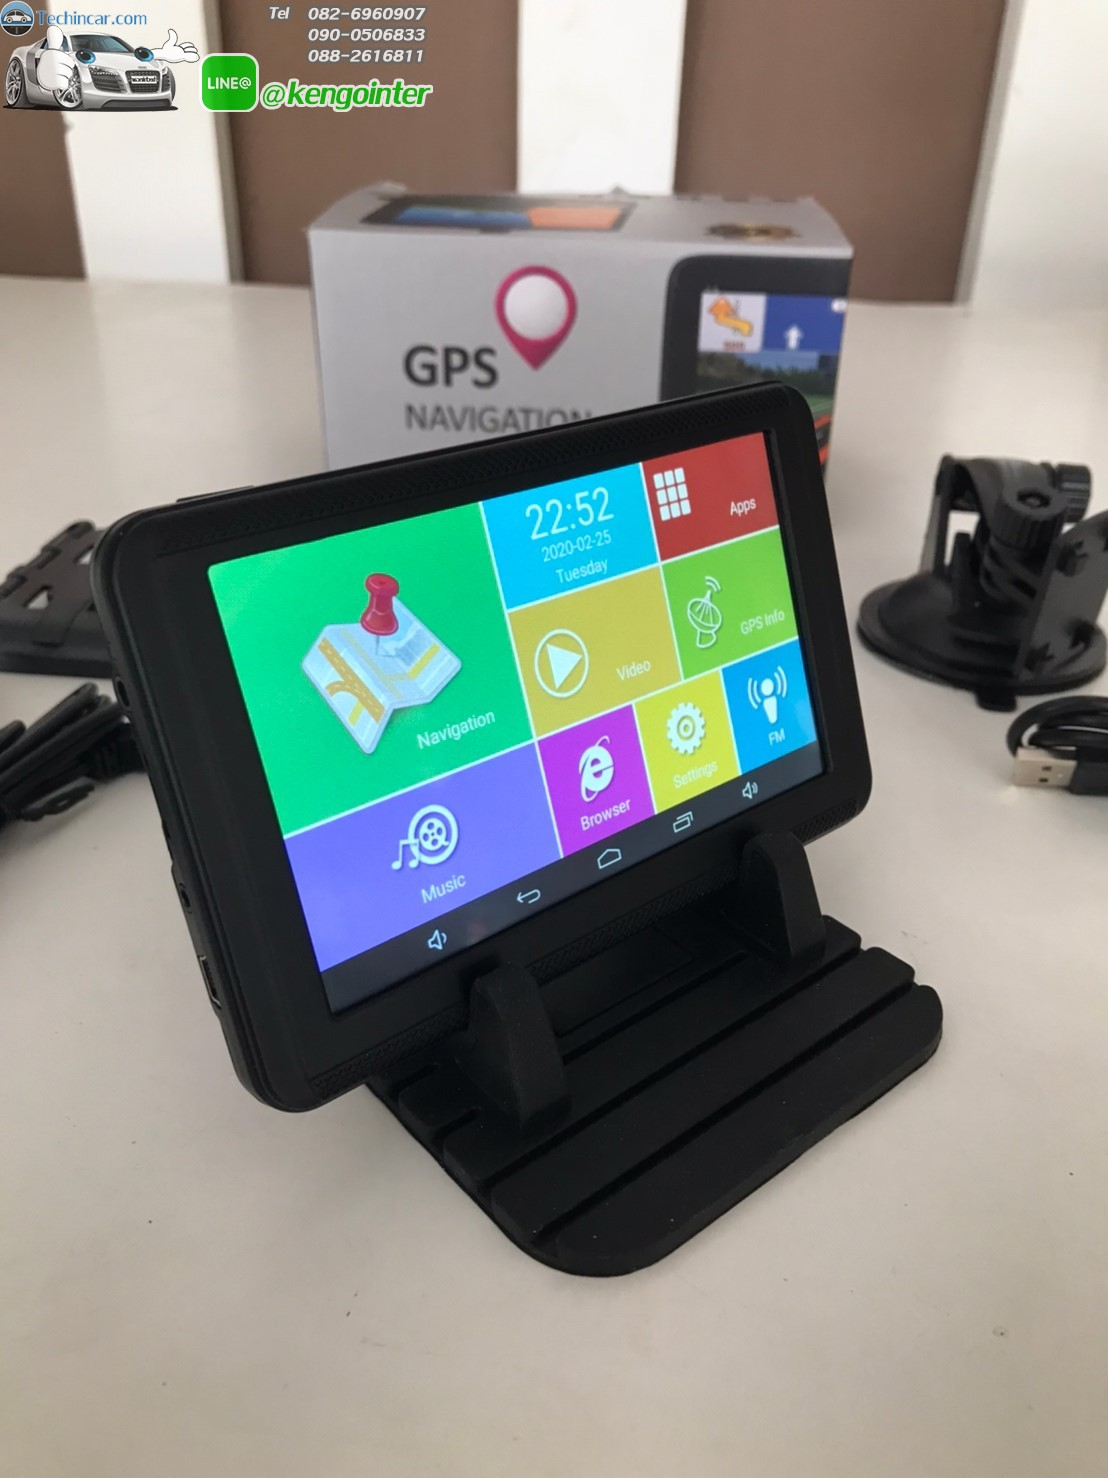 GPSนำทาง จอ 5 นิ้ว นำทาง ไม่ต้องใช้เน็ต จอแอนดรอย andorid in car